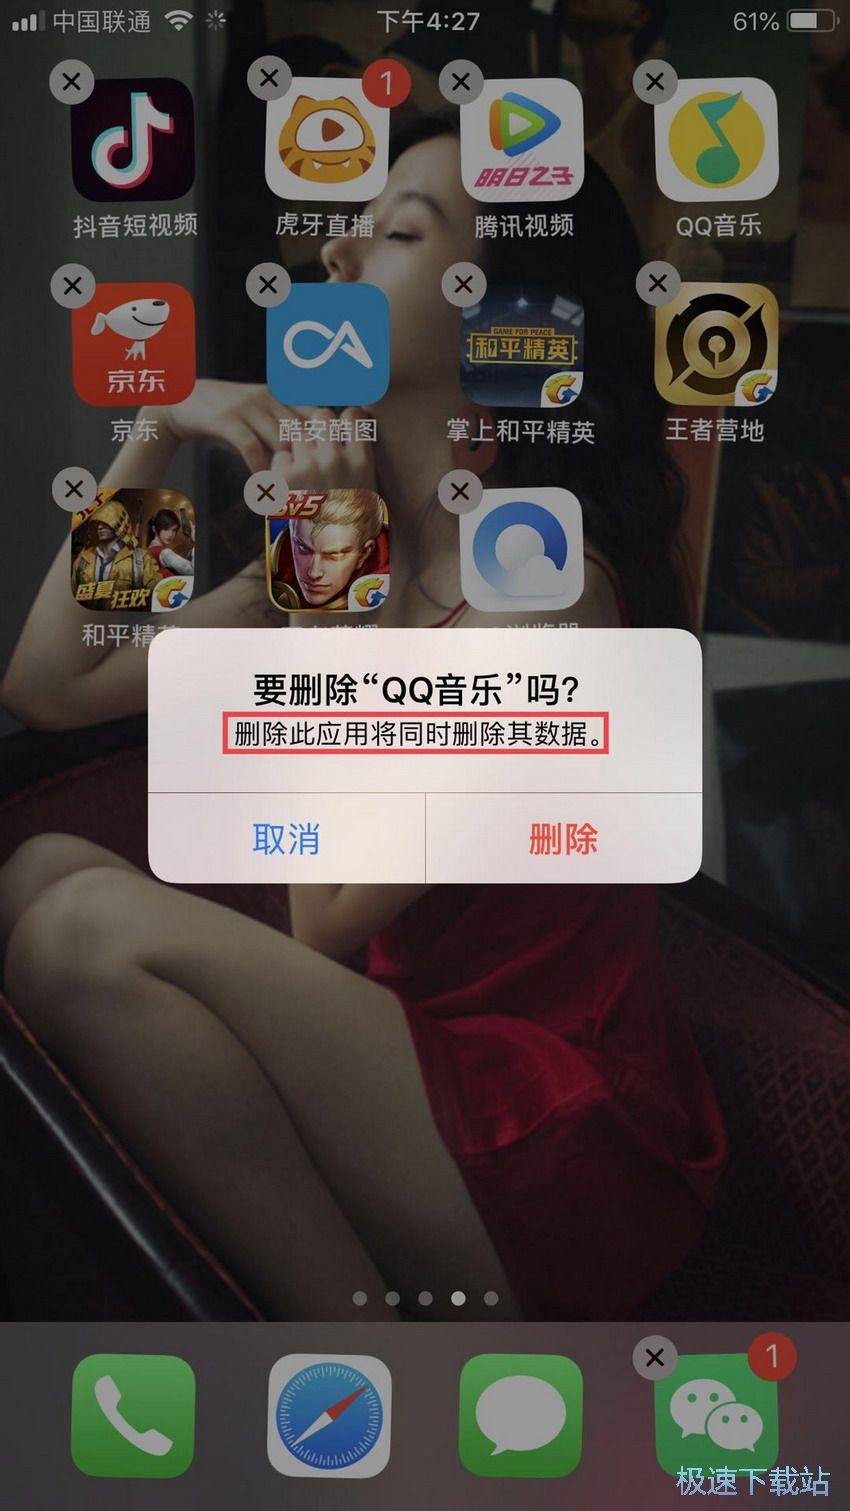 iPhone长按图标删除app会有数据残留吗? 缩略图